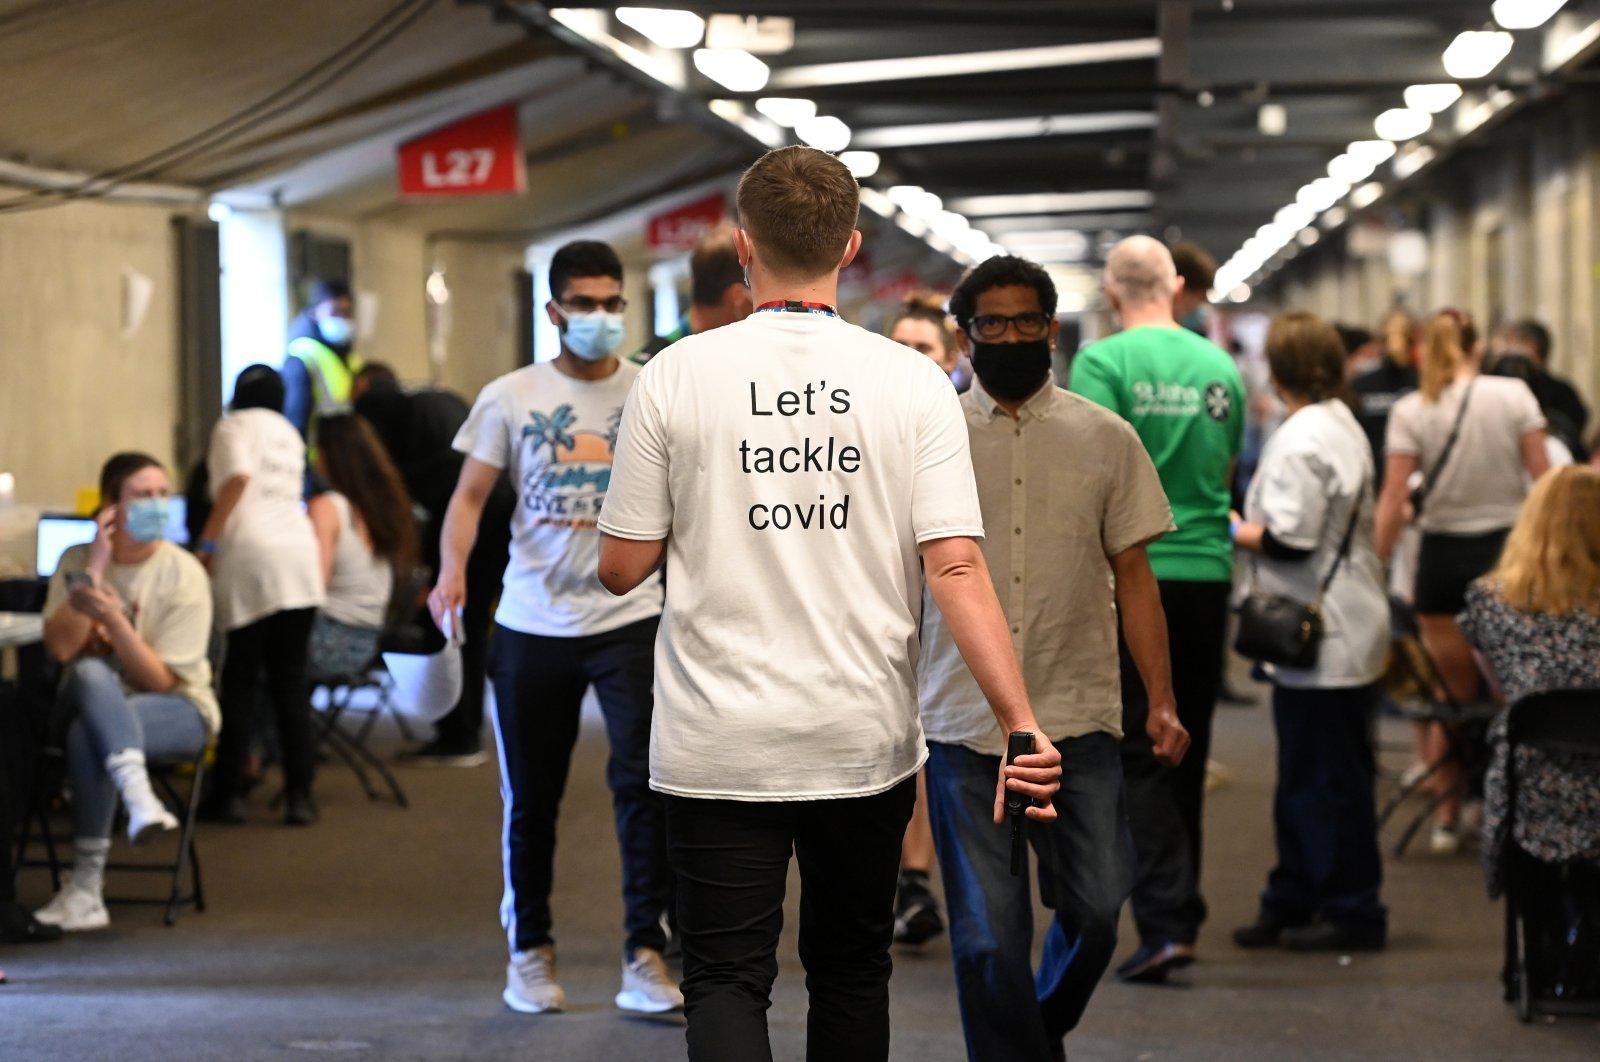 Young people wait to receive COVID-19 jabs at Twickenham Stadium in London, U.K., May 31, 2021. (EPA Photo)